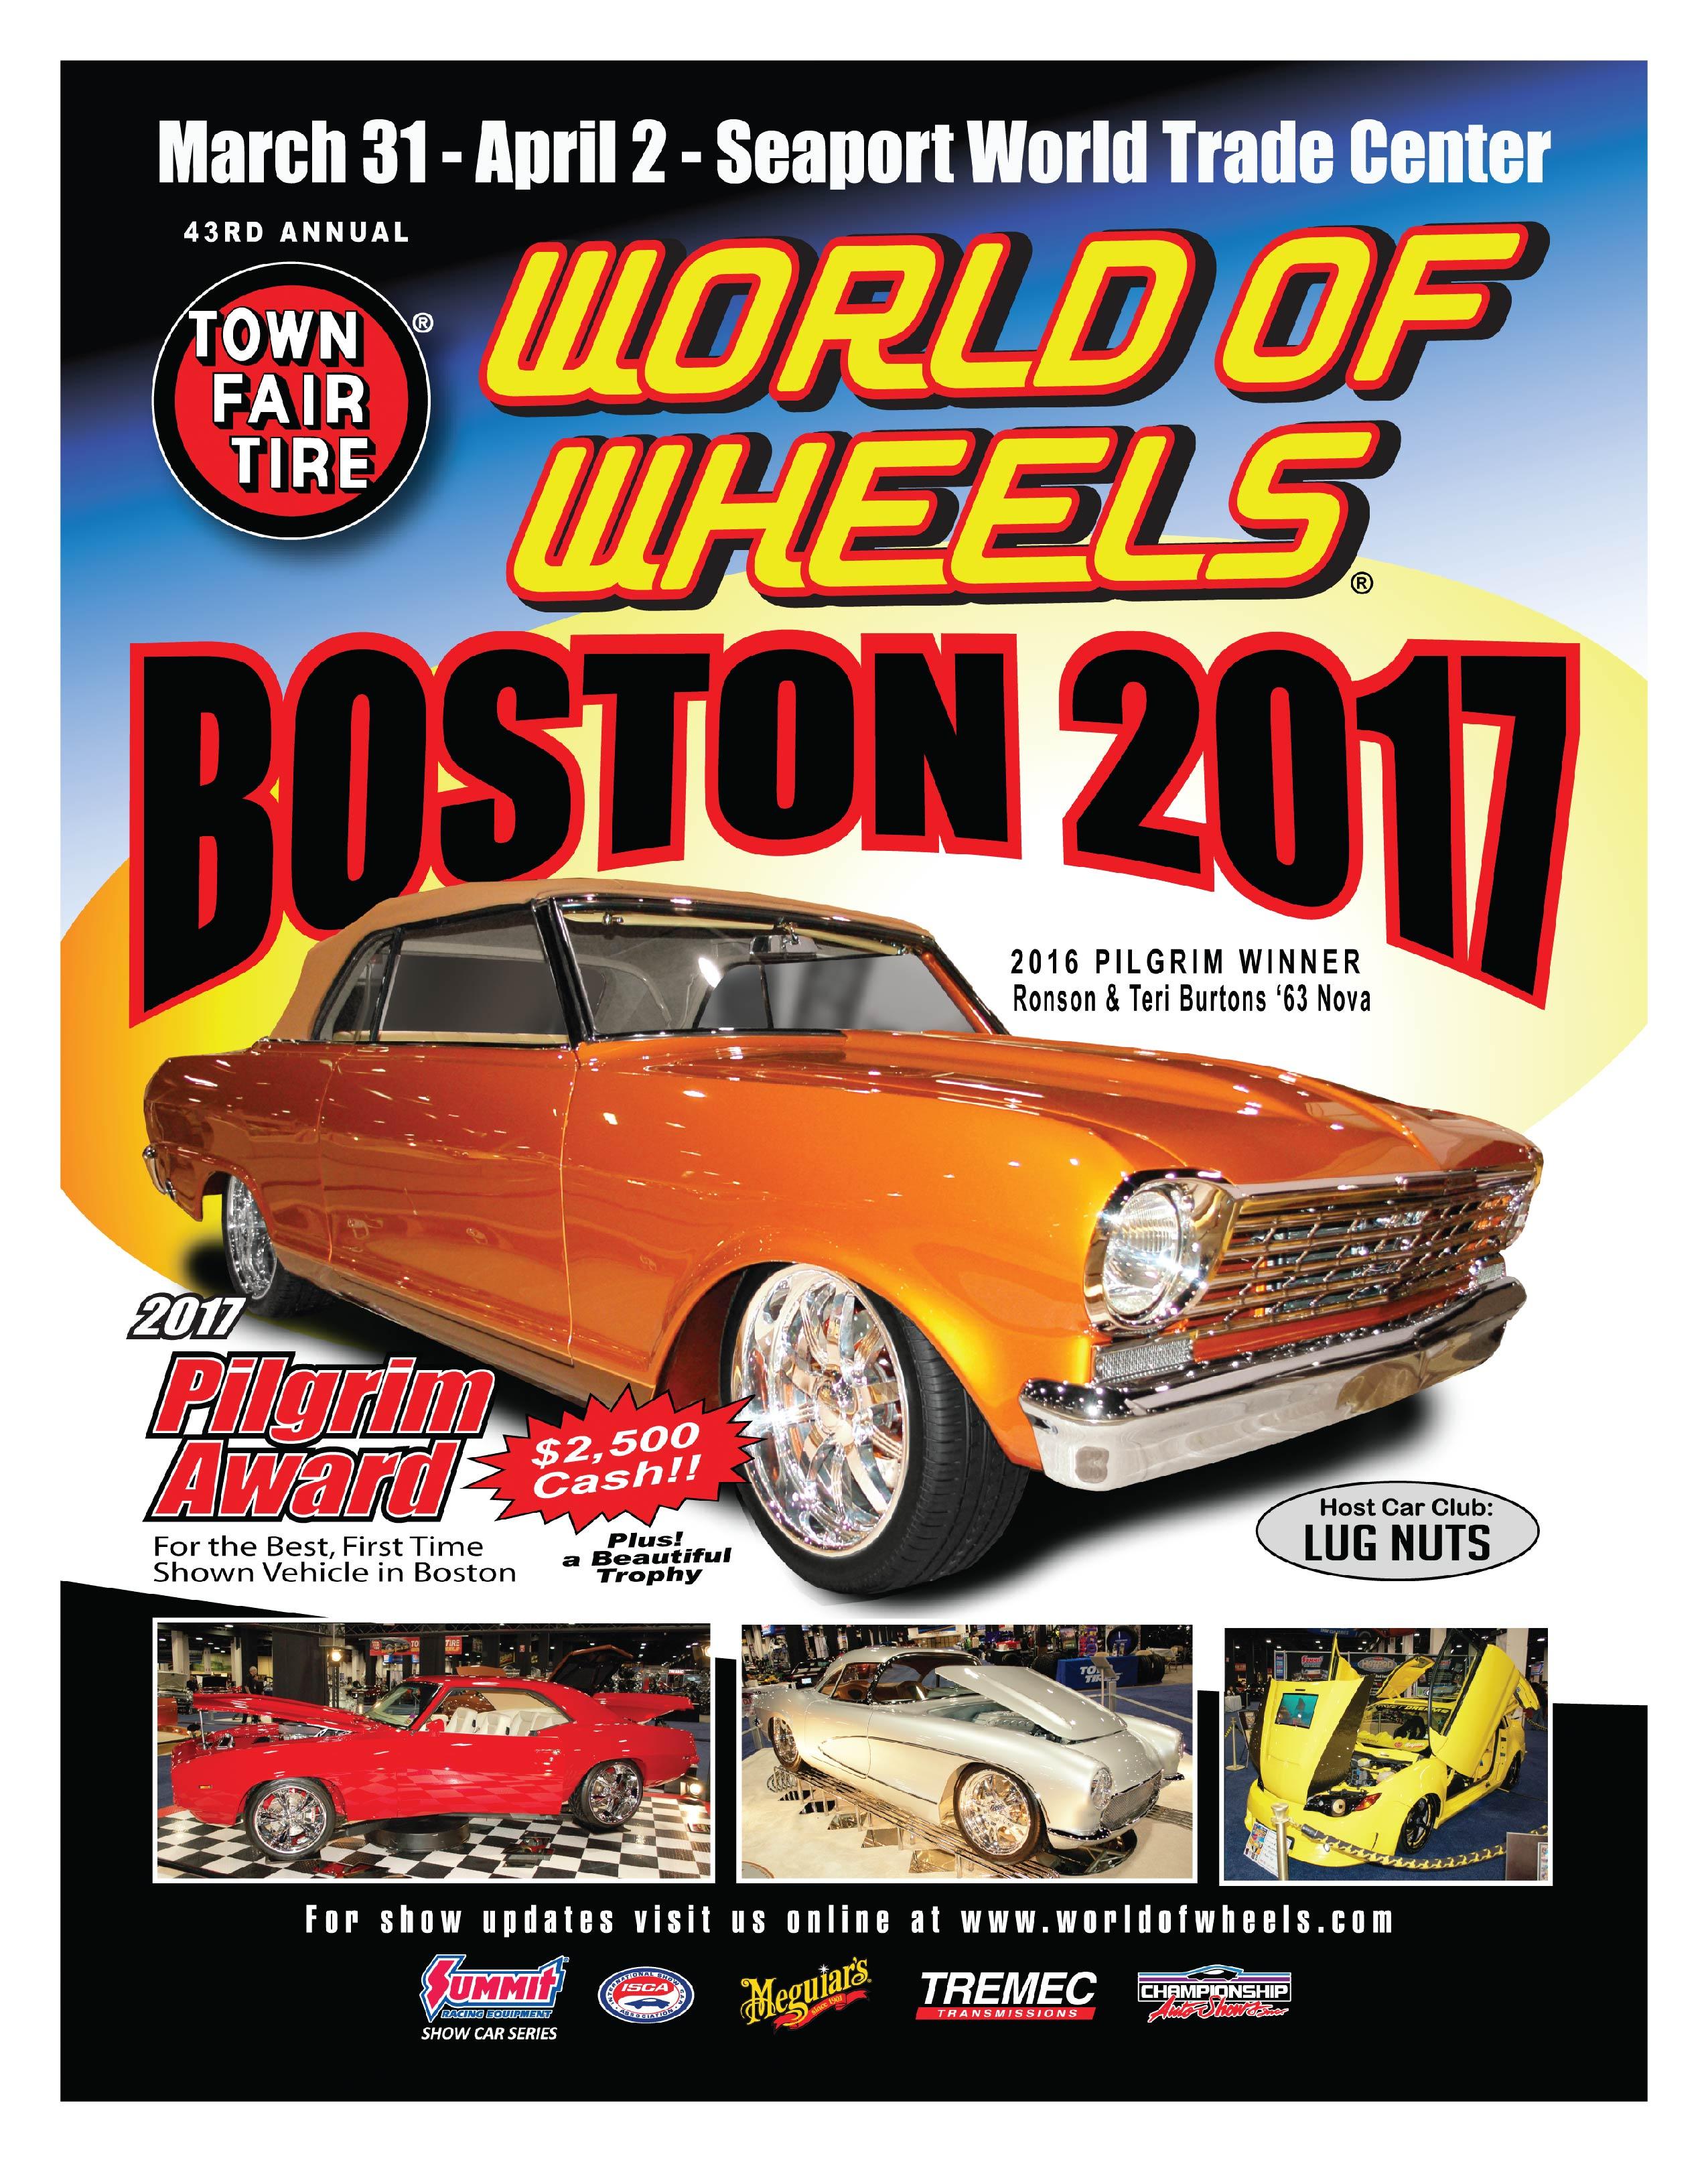 World Of Wheels Boston >> Boston World Of Wheels 2017 At Seaport World Trade Center